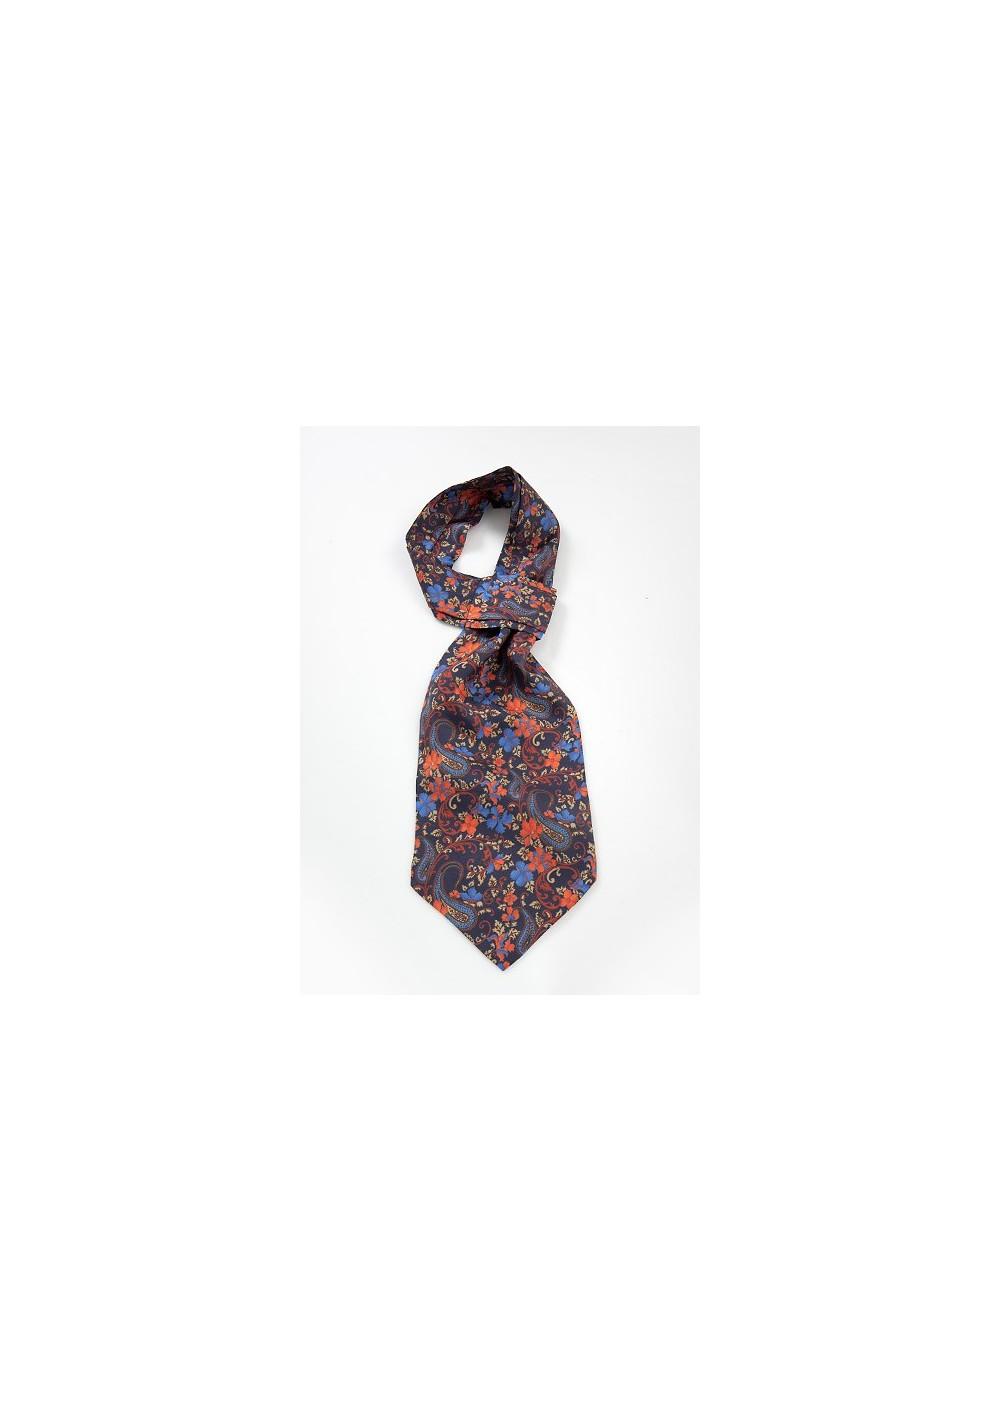 Designer Floral Paisley Ascot Tie